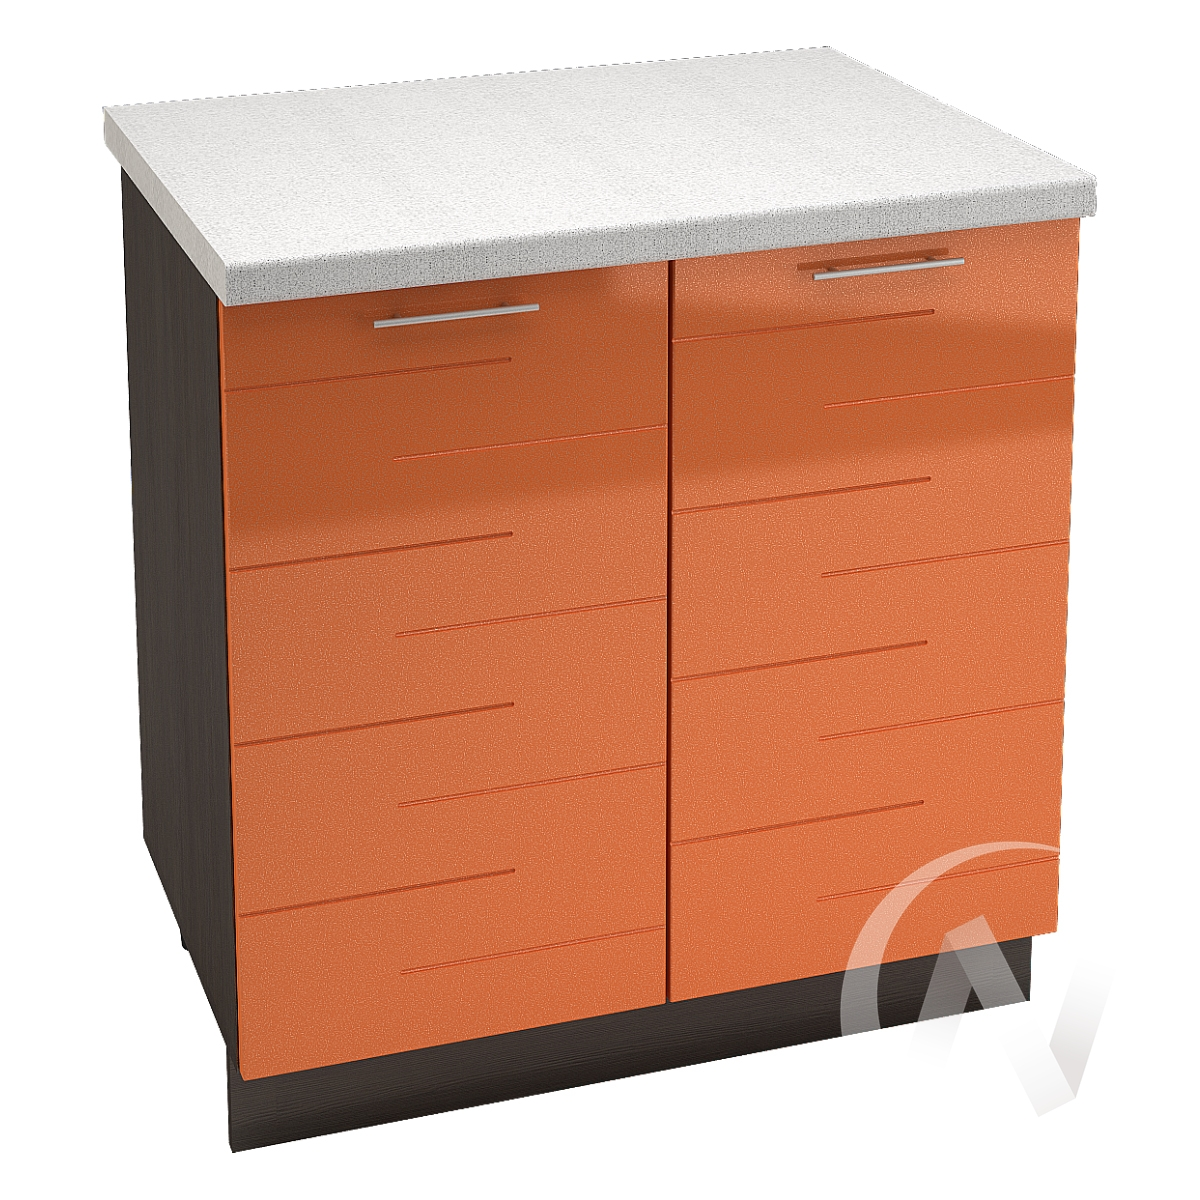 "Кухня ""Техно"": Шкаф нижний 800, ШН 800 (корпус венге)"